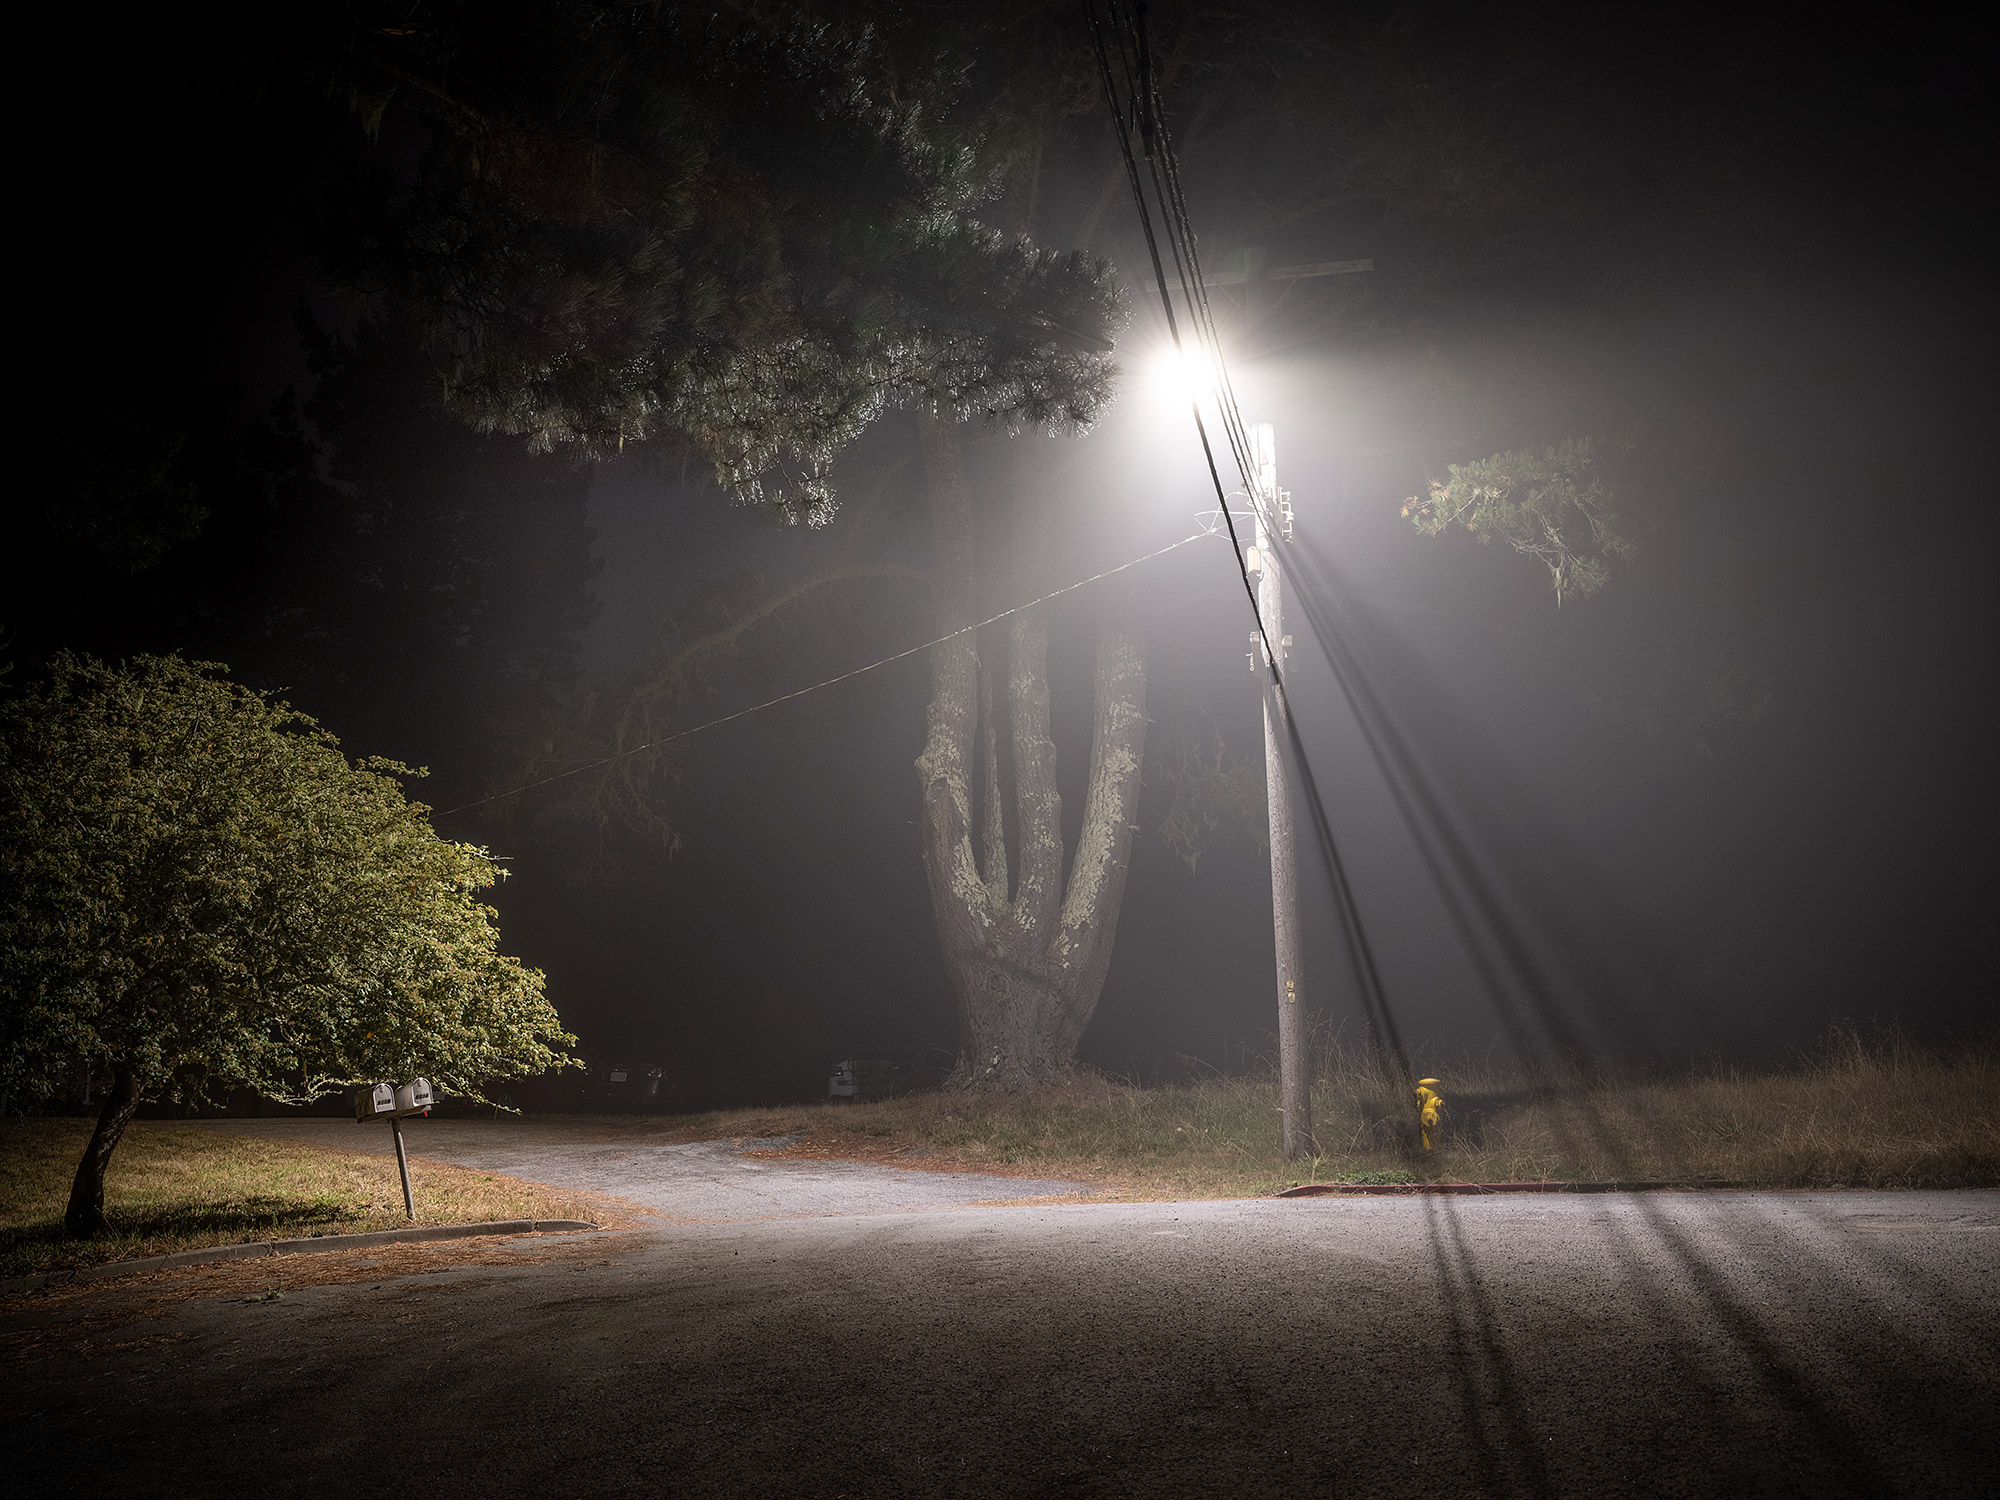 Street image of light and tree.